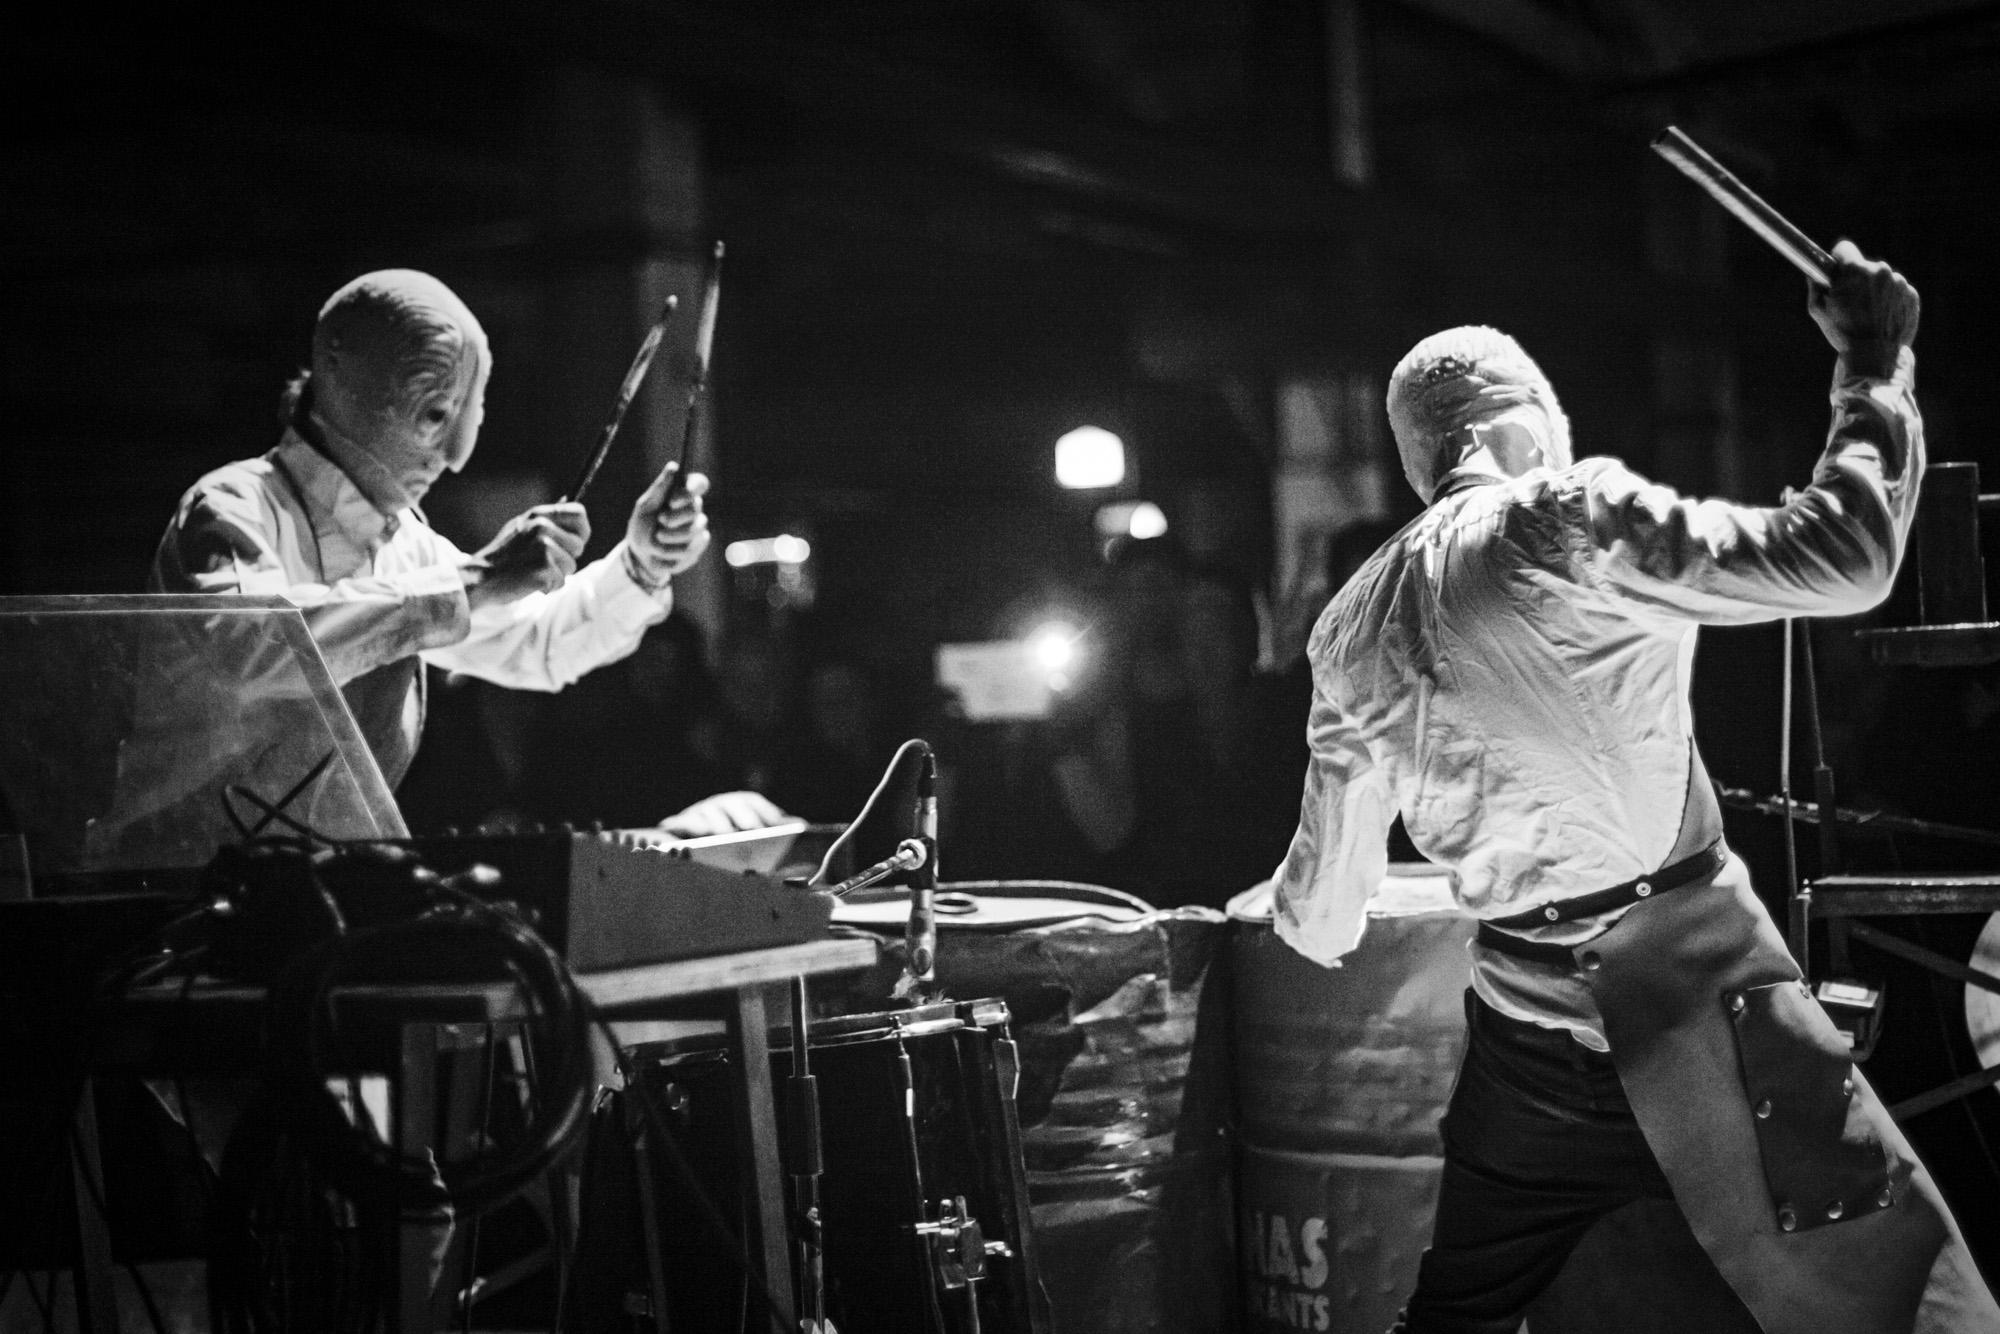 Rota de Fero live ad Oz - Roma 2017